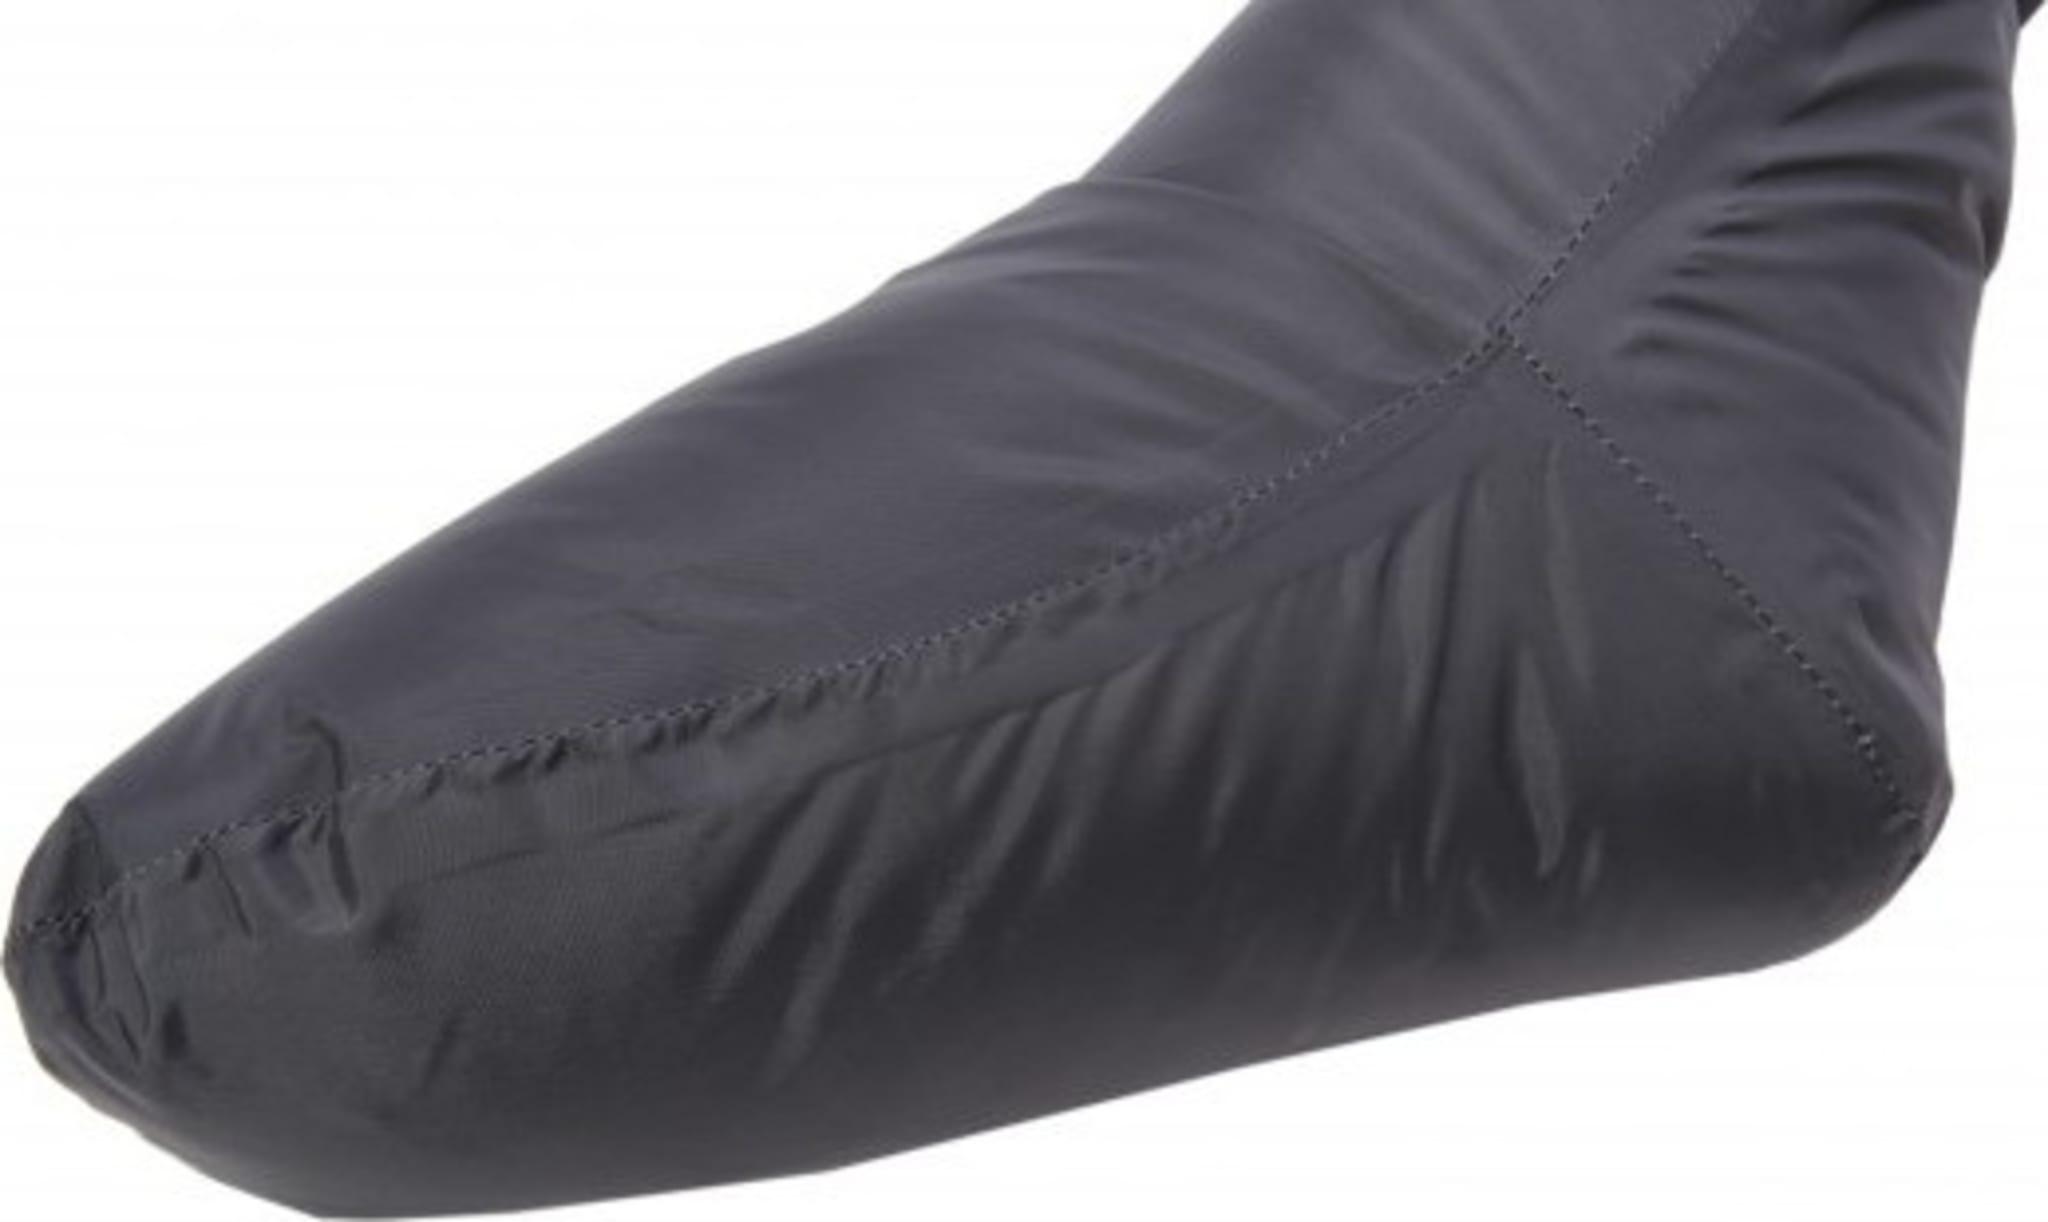 VBL Socks